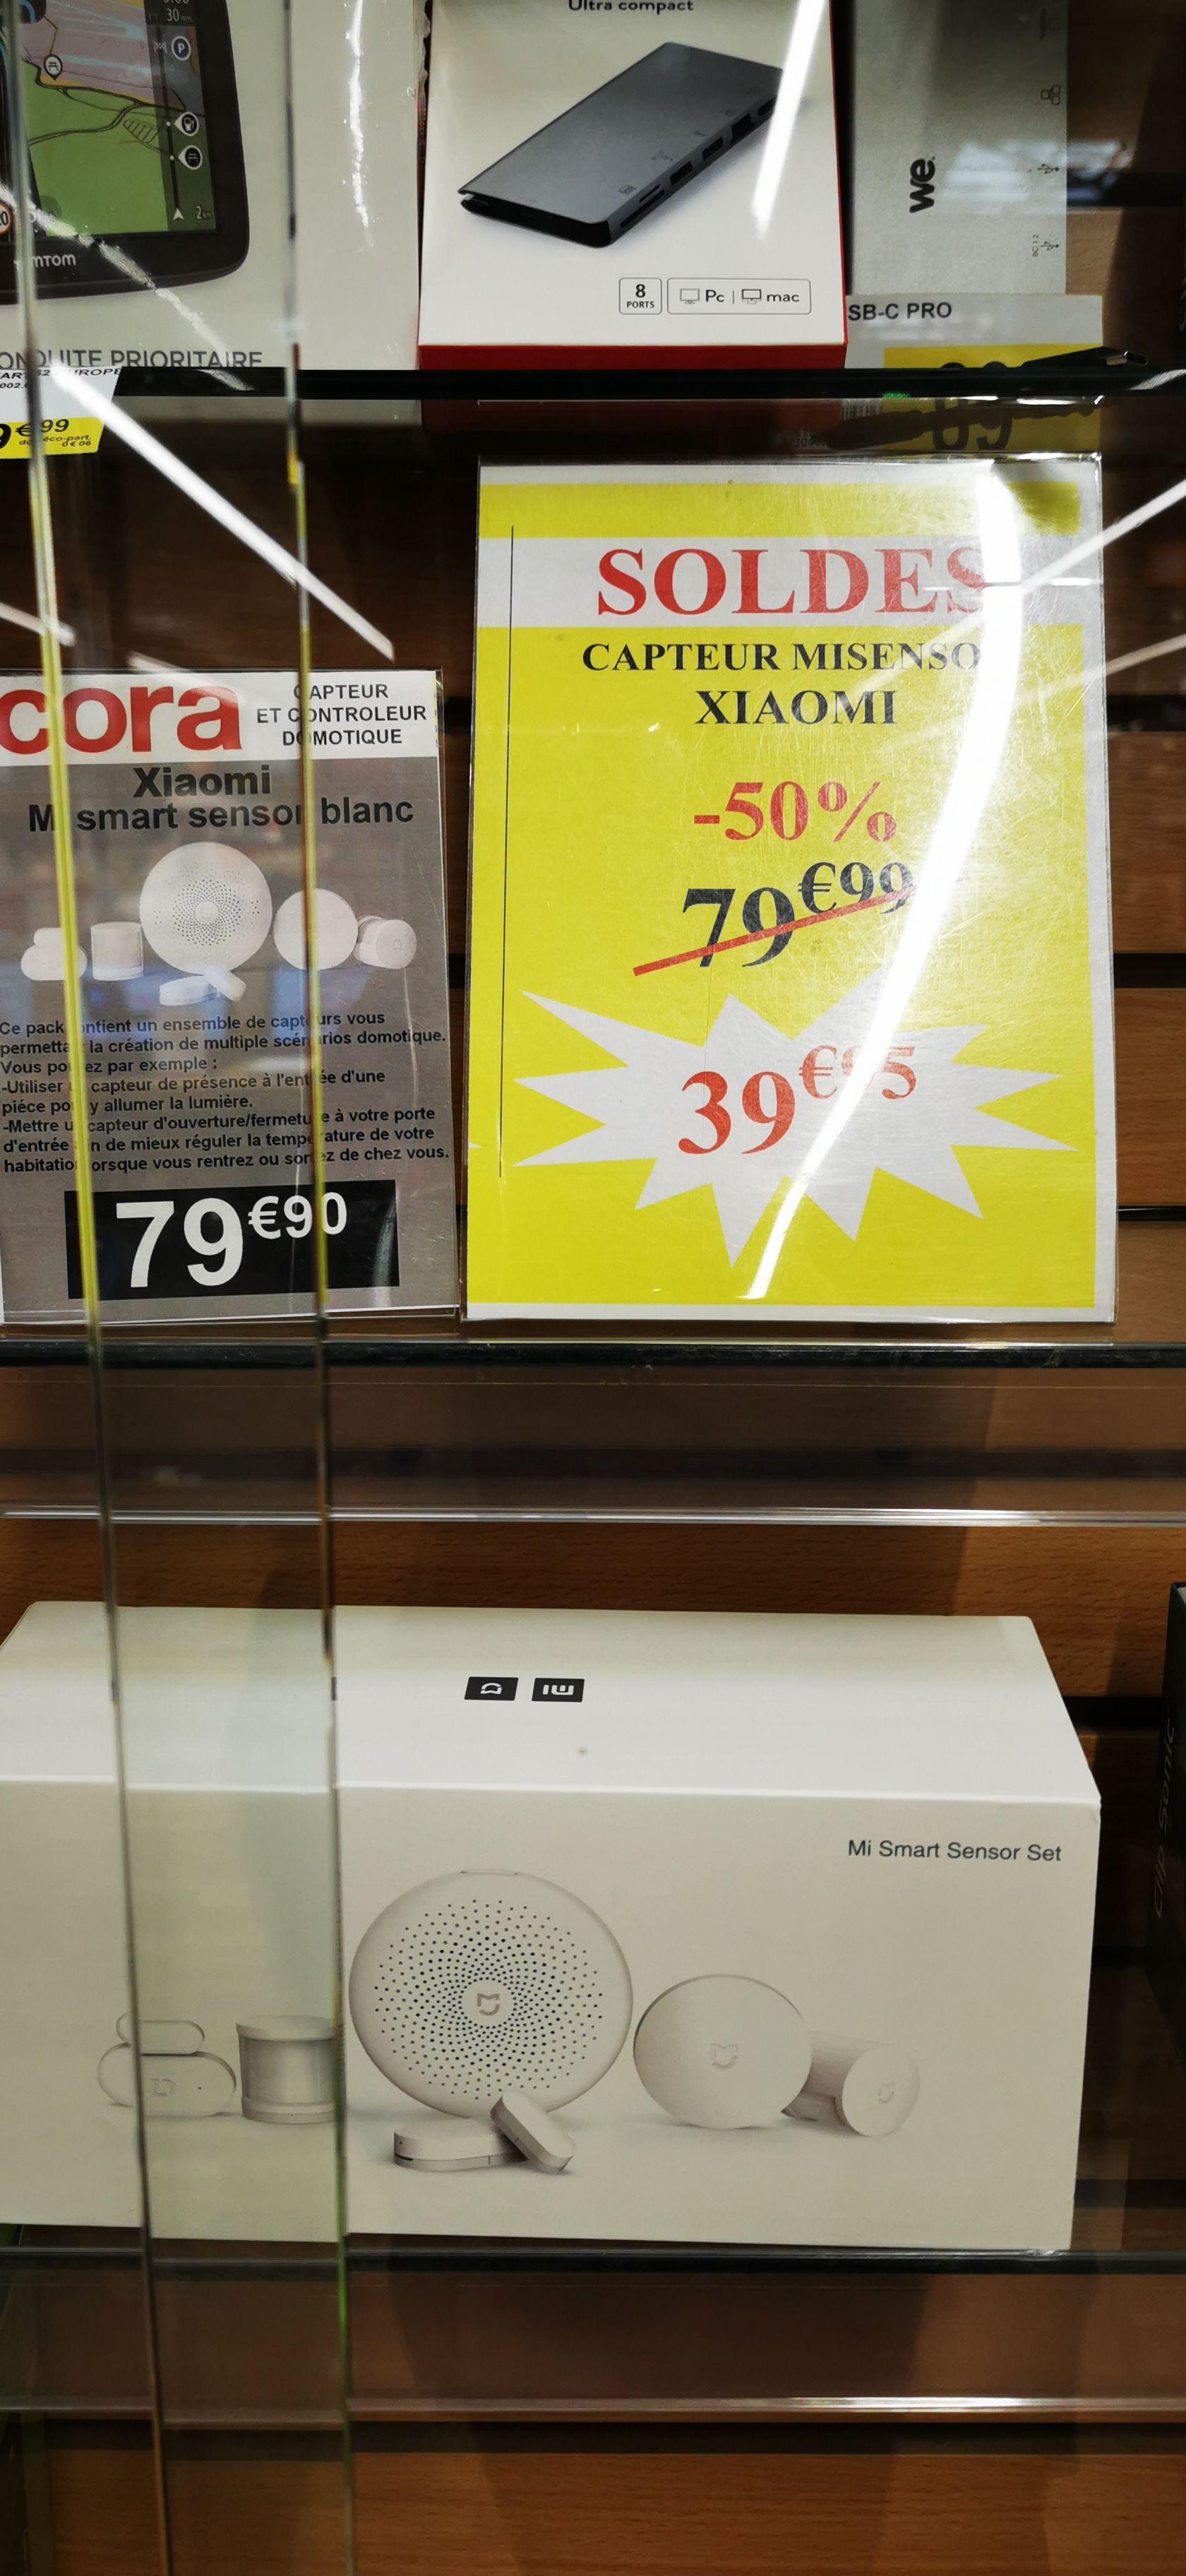 Kit d'alarme connectée Xiaomi Smart Home MI Sensor - Heillecourt (54)